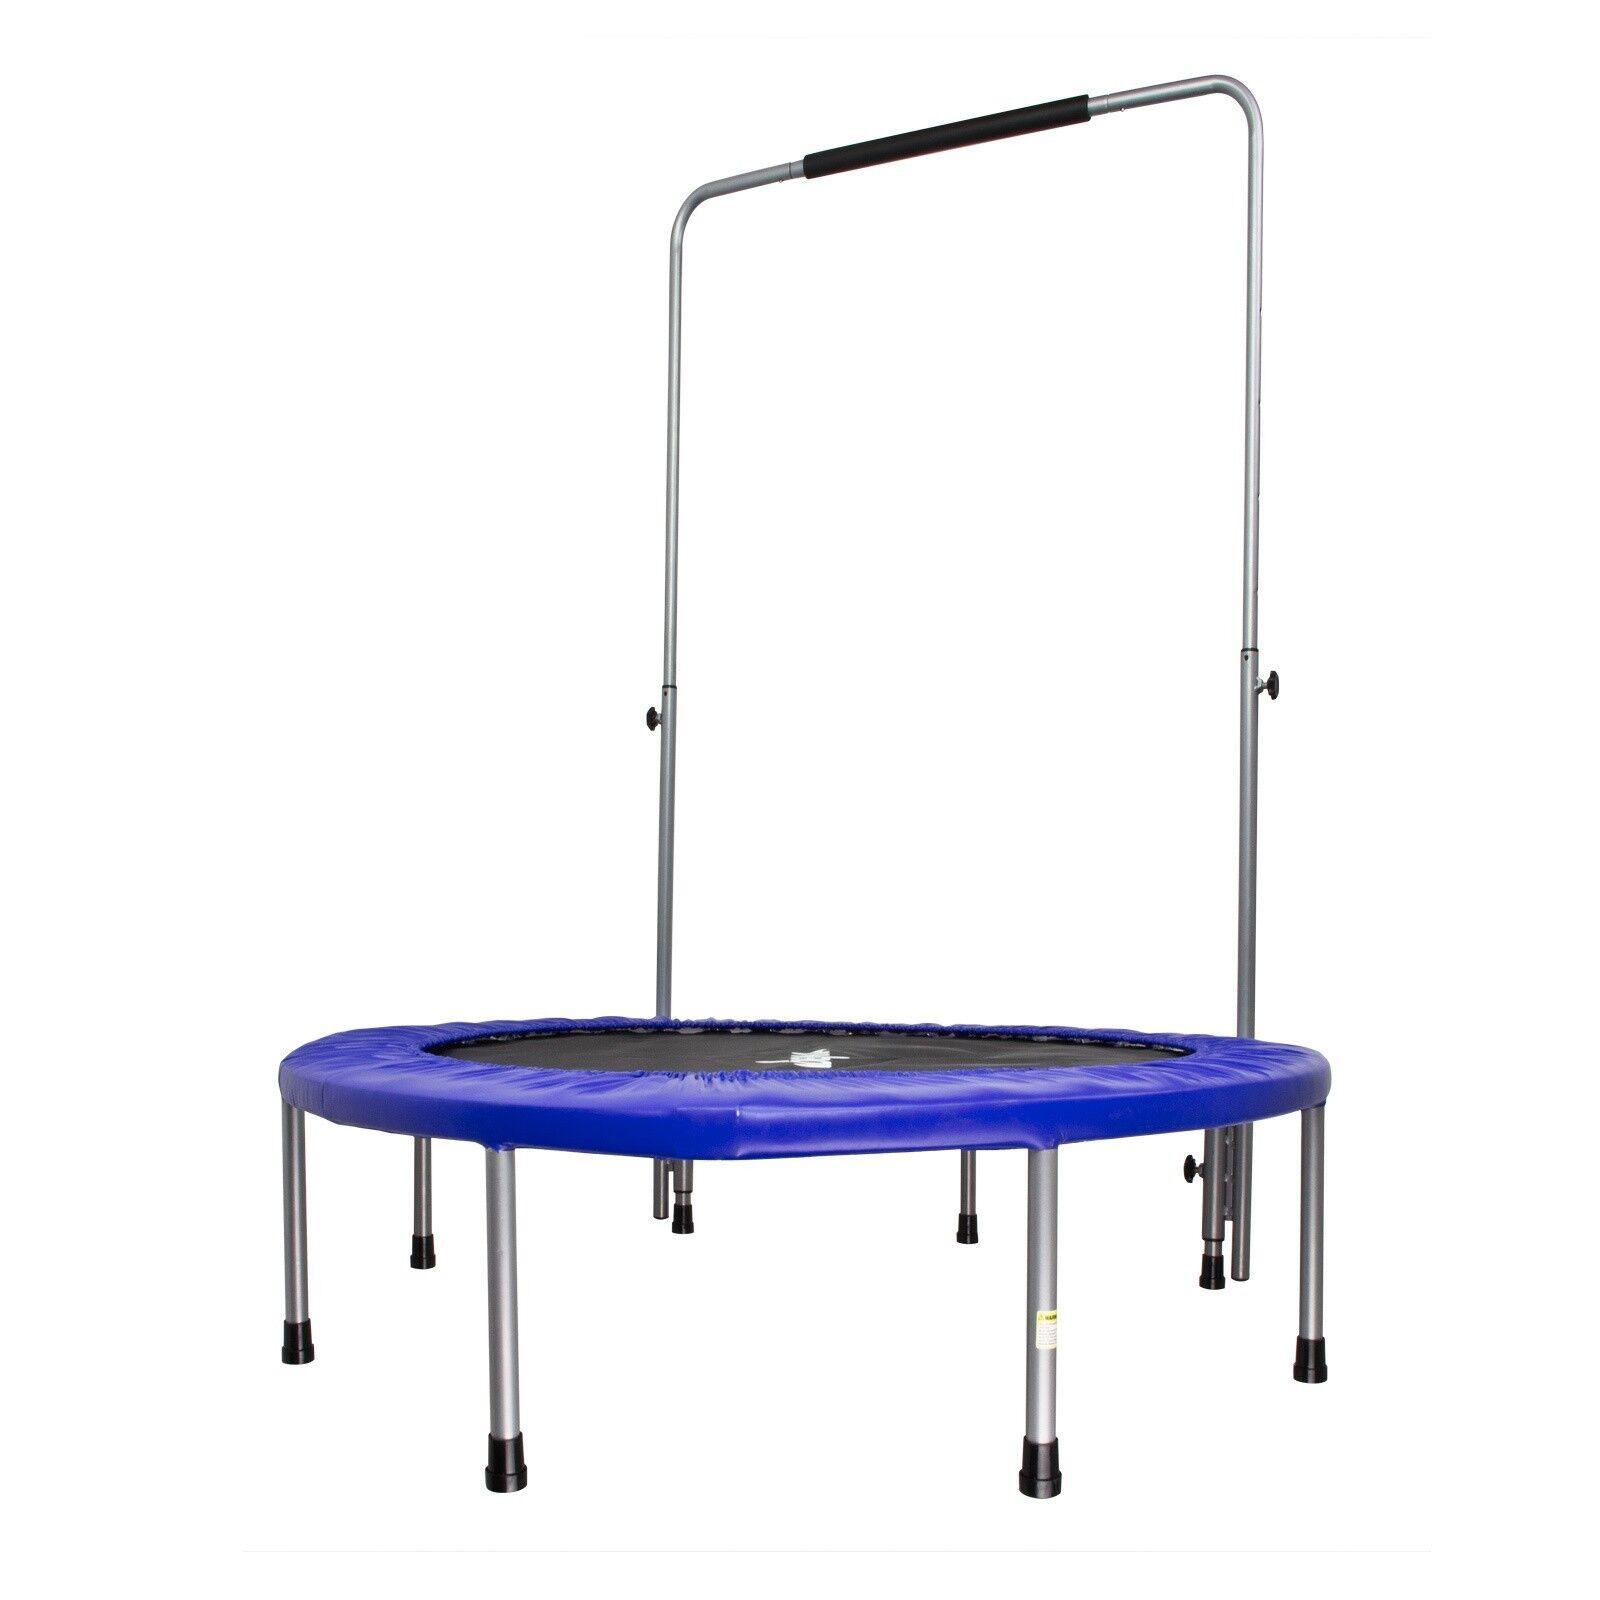 Falt Fitness Trampolin Gartentrampolin blau 122cm + Haltegriff bis 100 kg